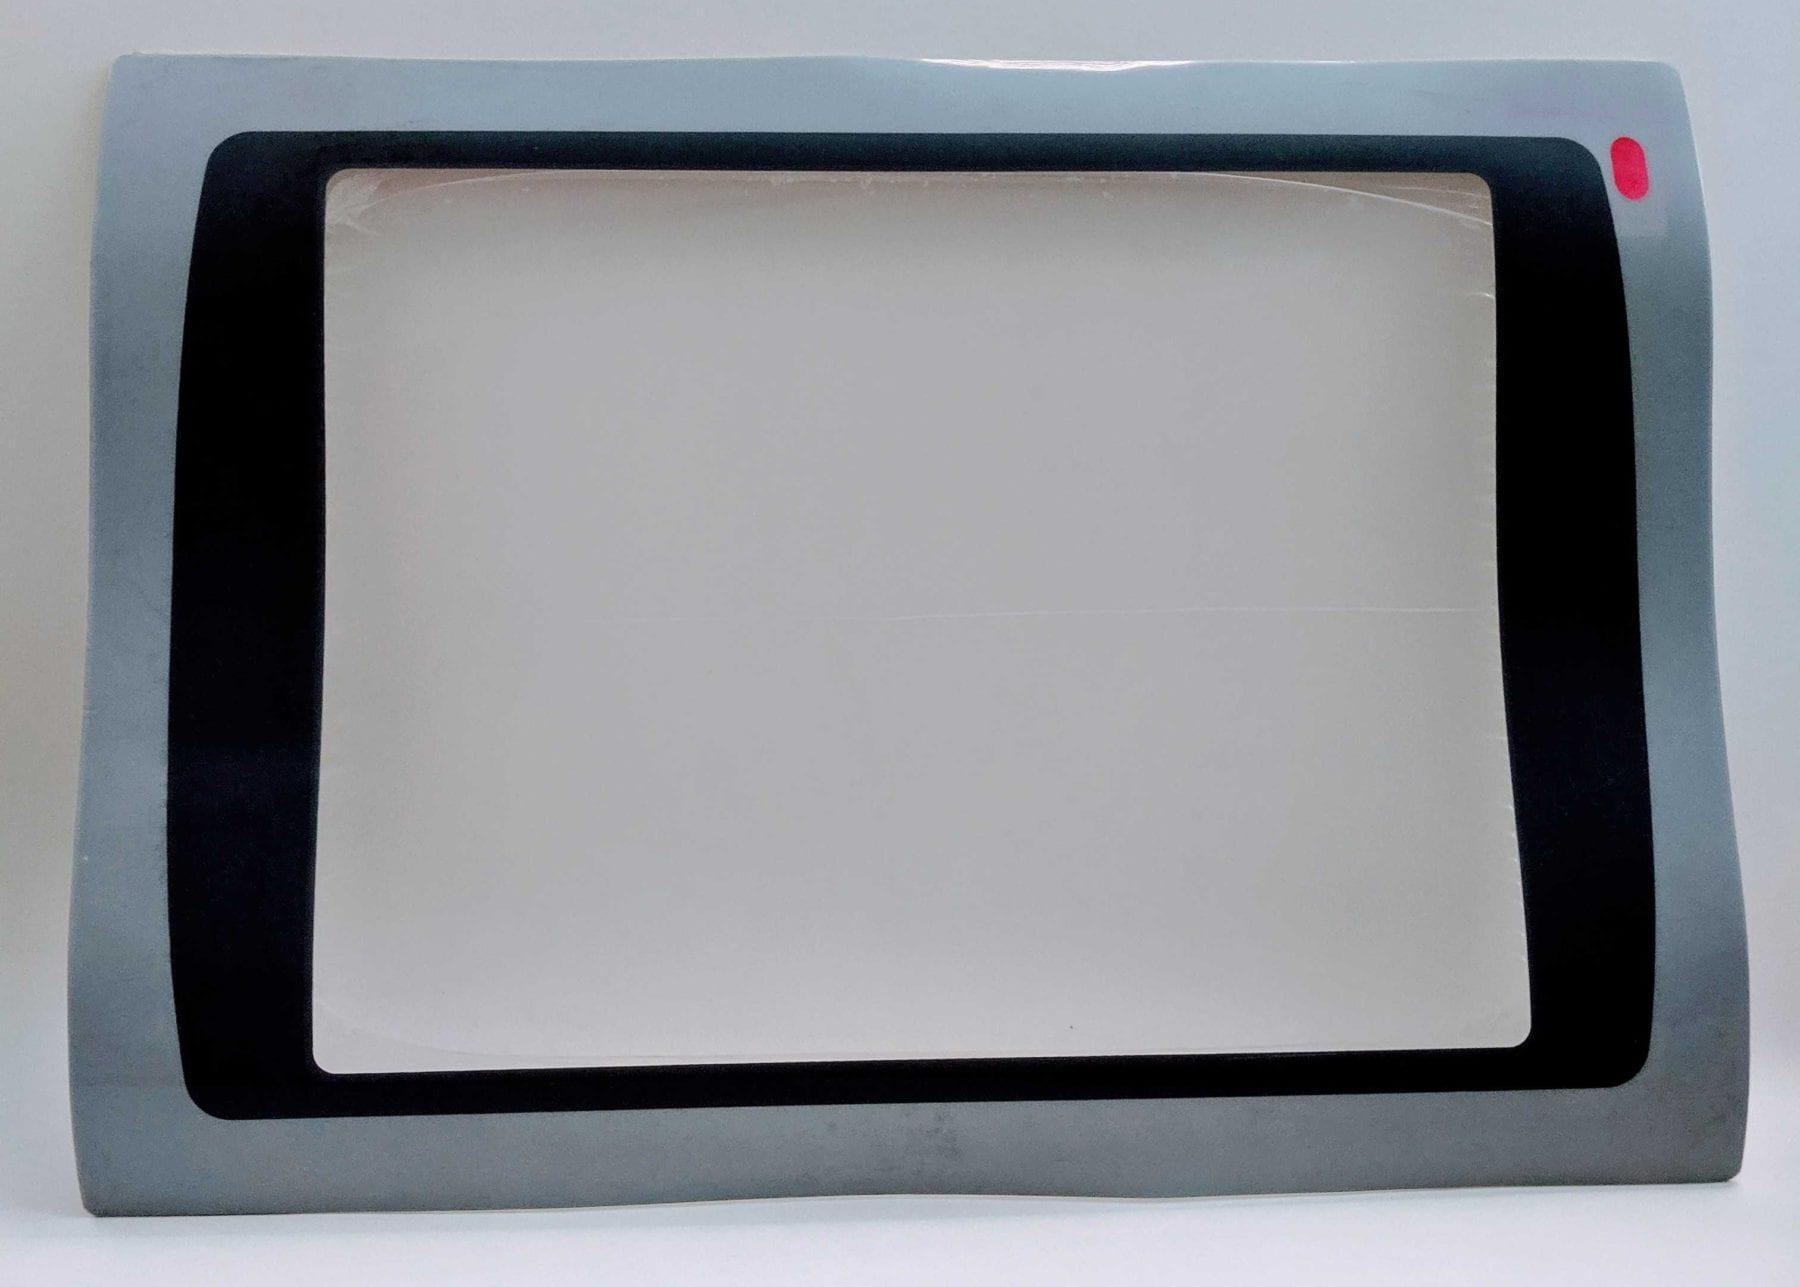 Panelview Plus 1250 protective overlay